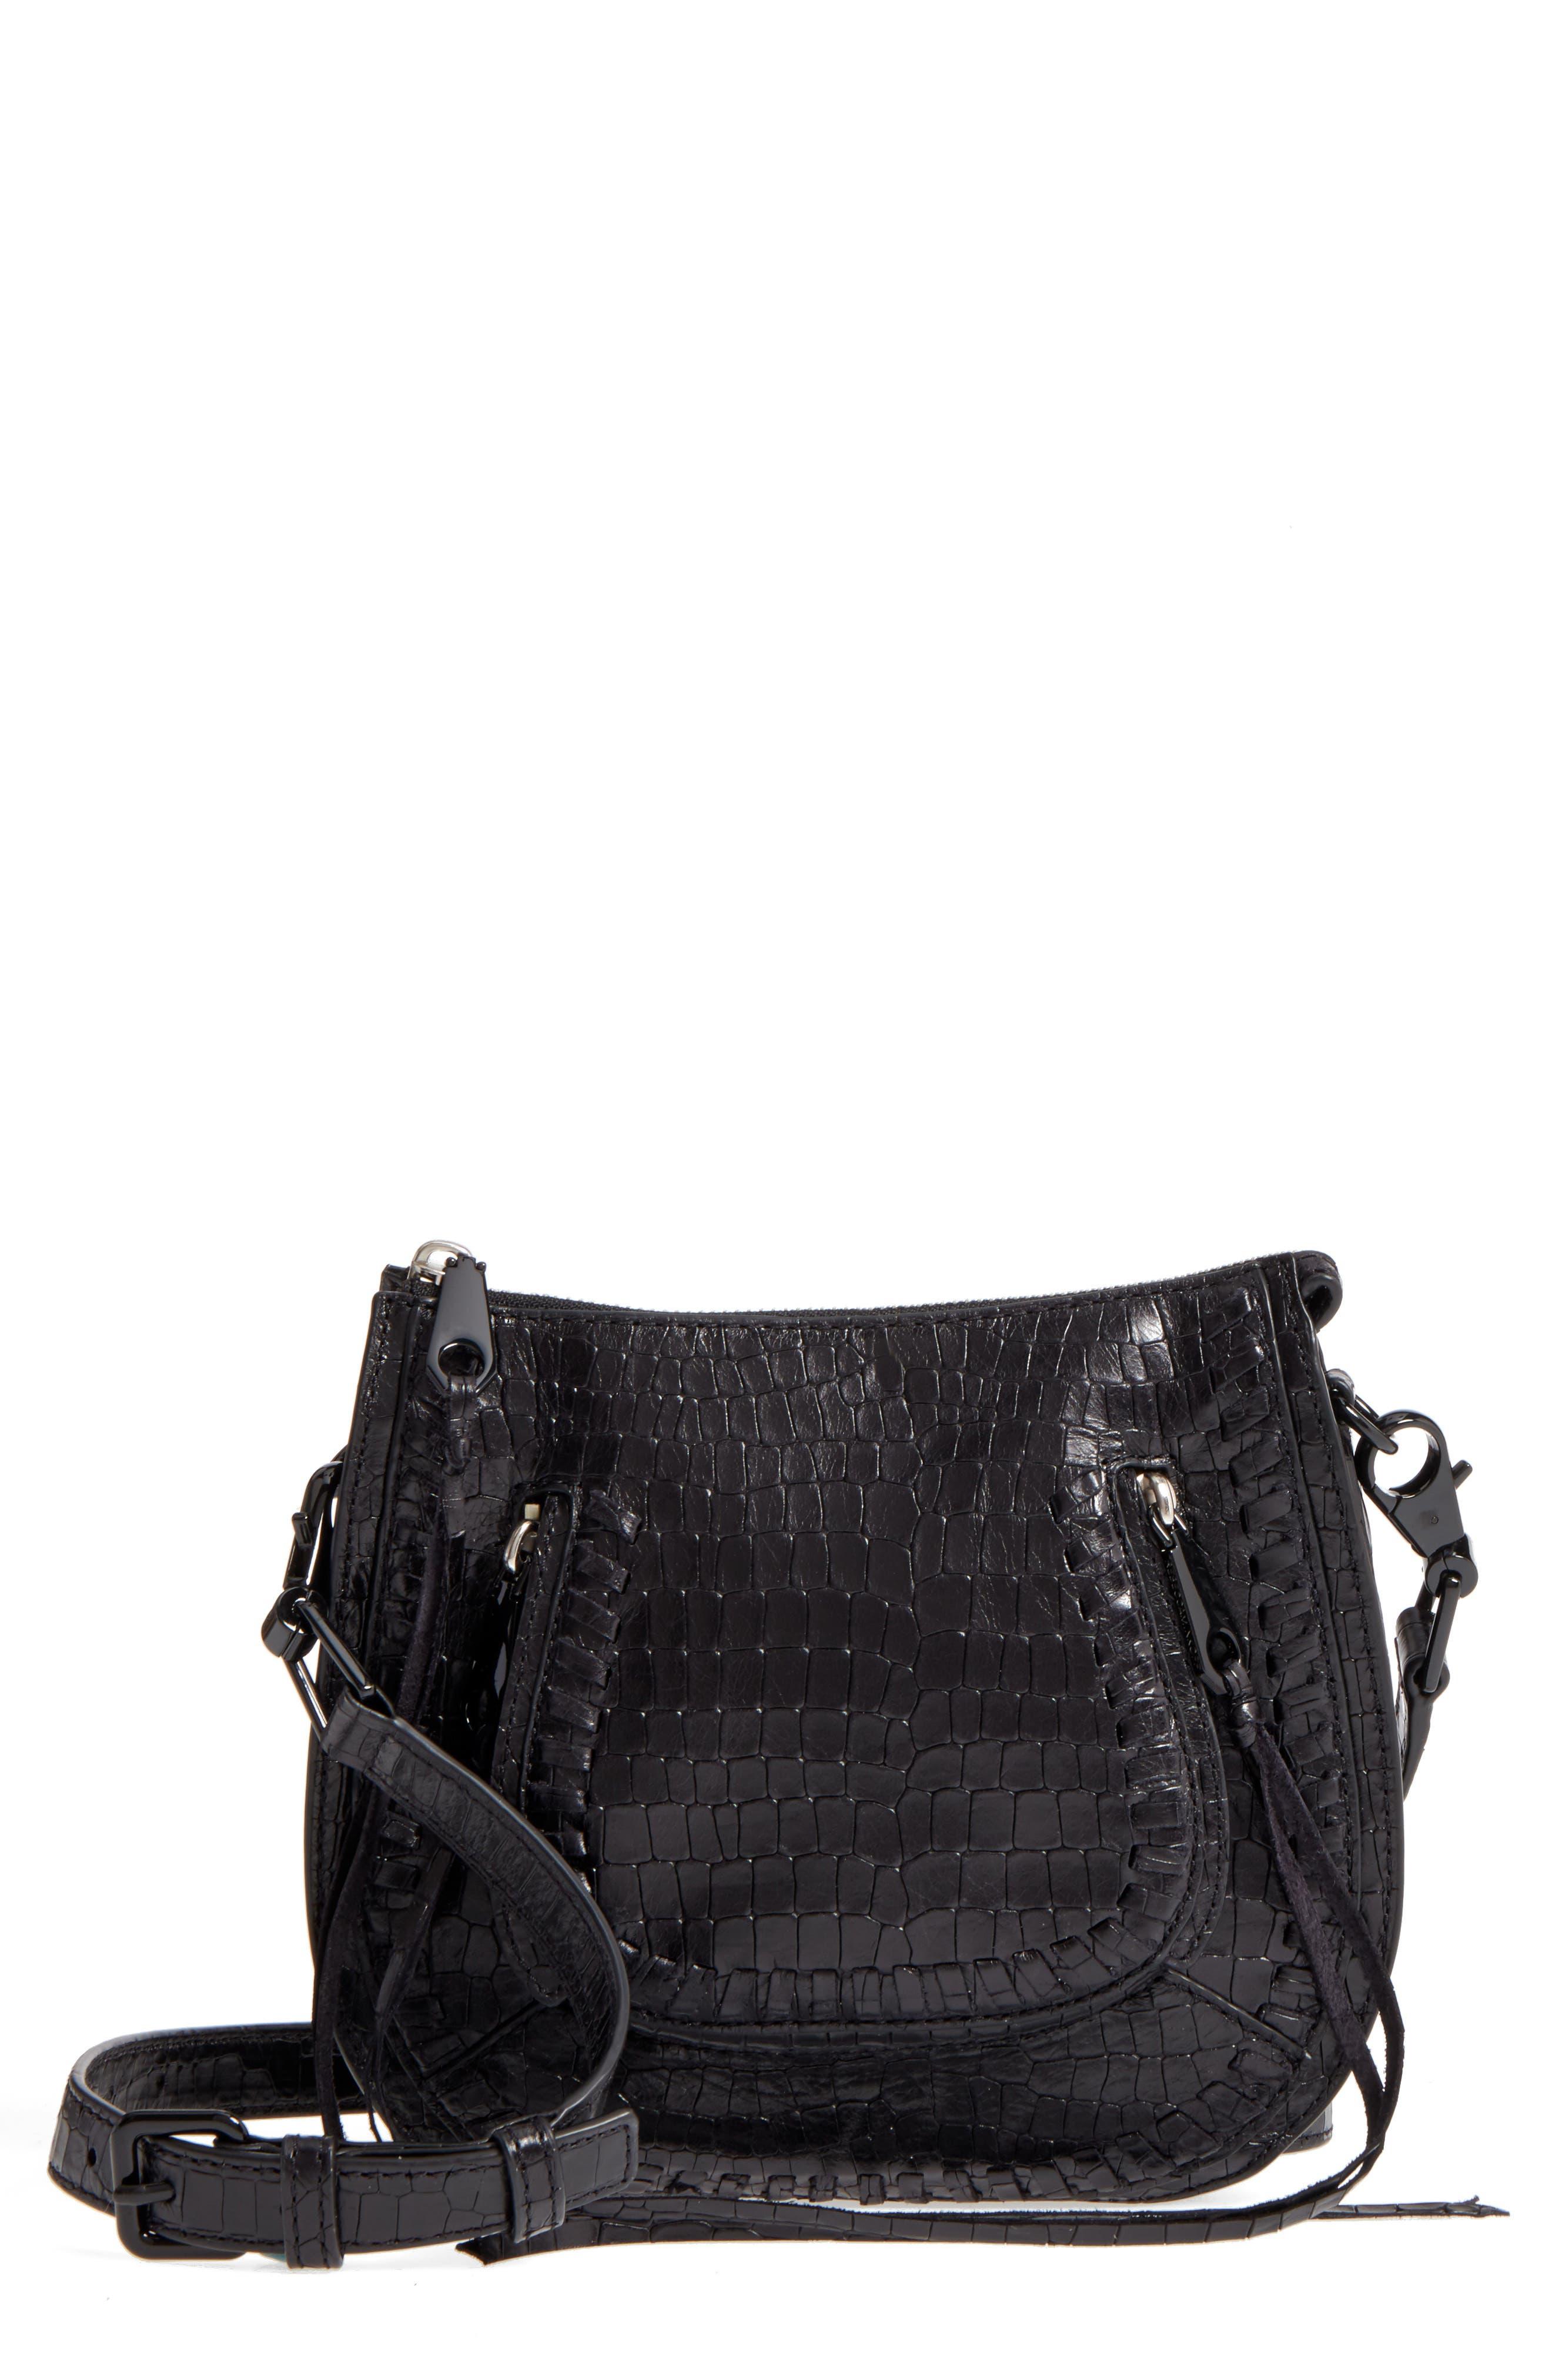 Main Image - Rebecca Minkoff Vanity Croc-Embossed Leather Saddle Bag